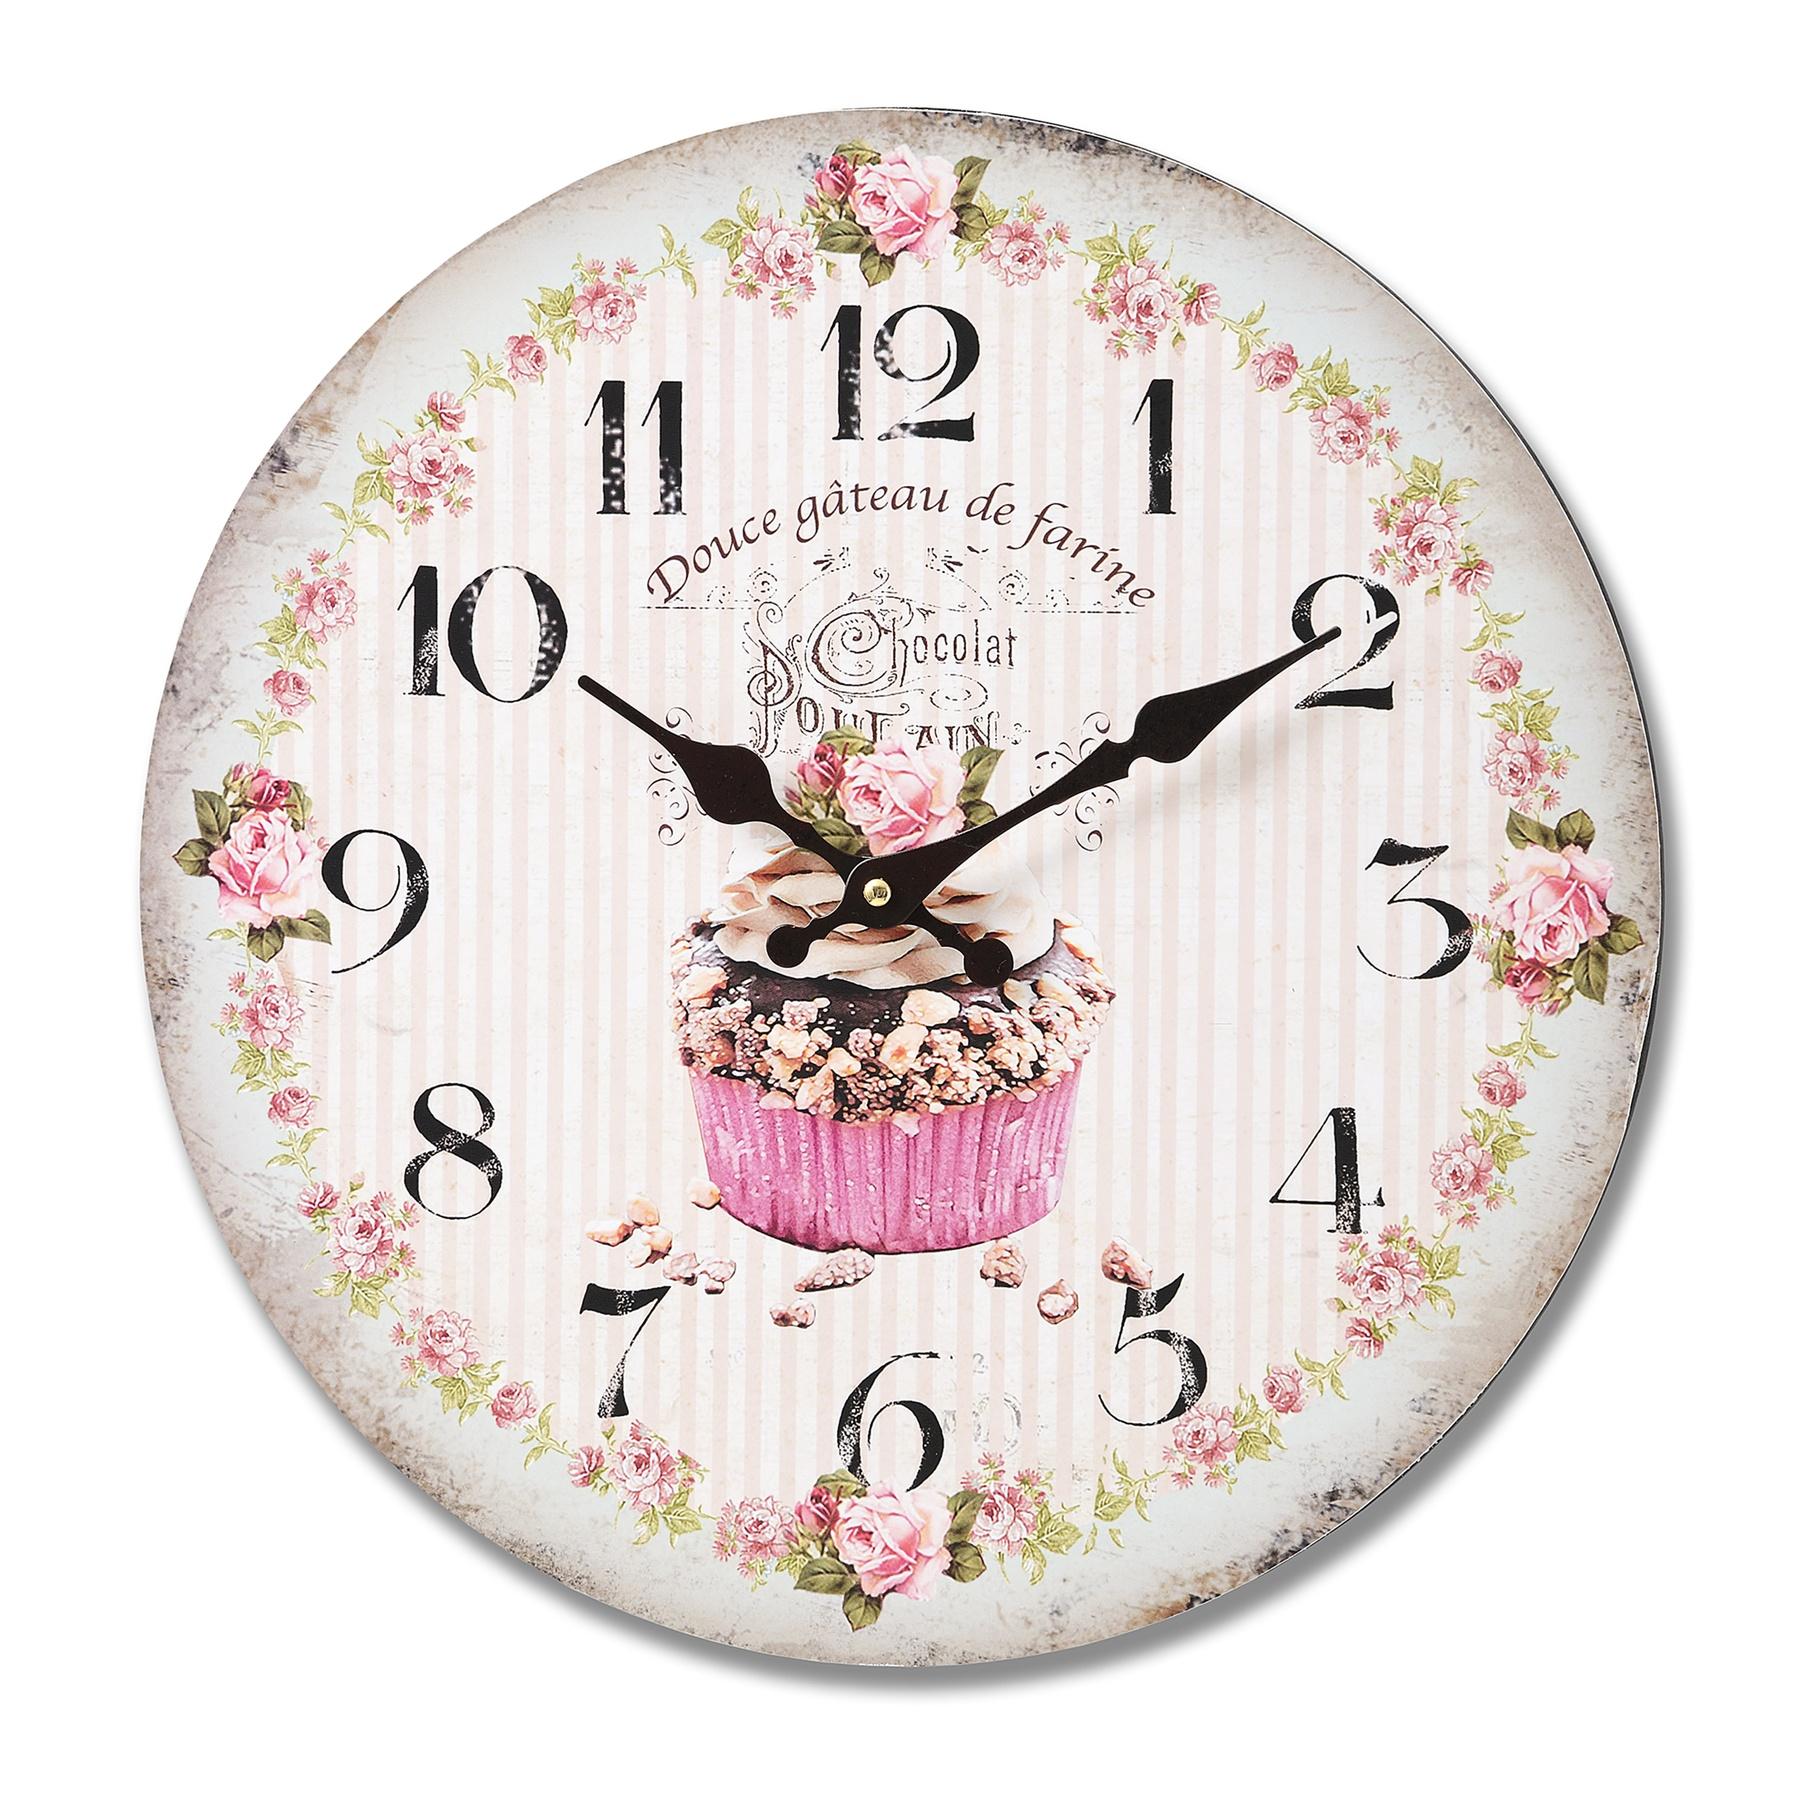 Wall Clock Floral Design : Hill interiors chocolat cupcake wall clock with floral